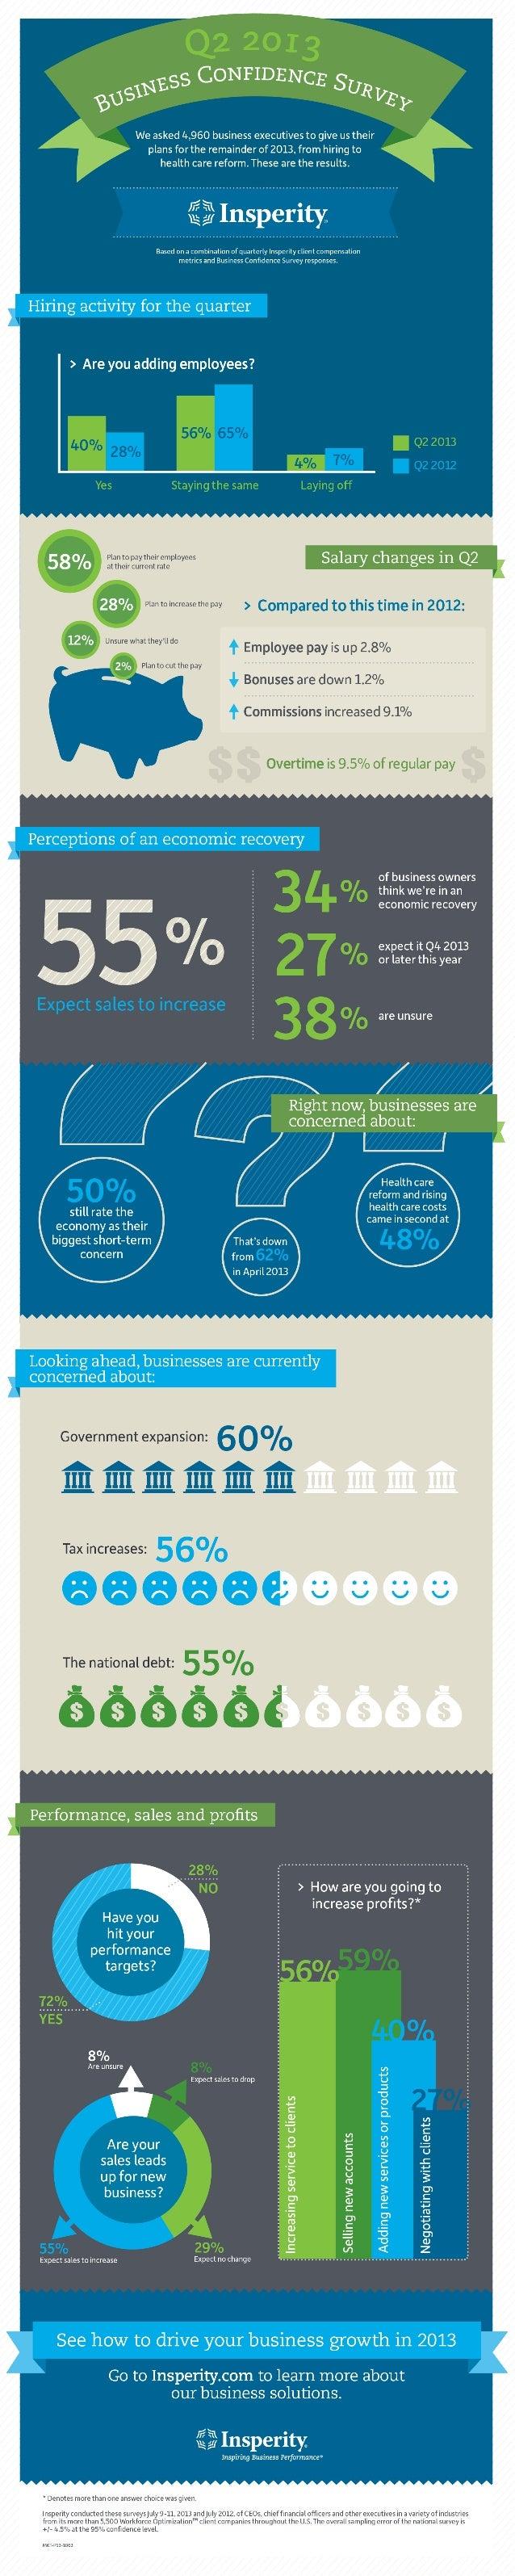 Insperity Business Confidence Survey: Q2 2013 [Infographic]